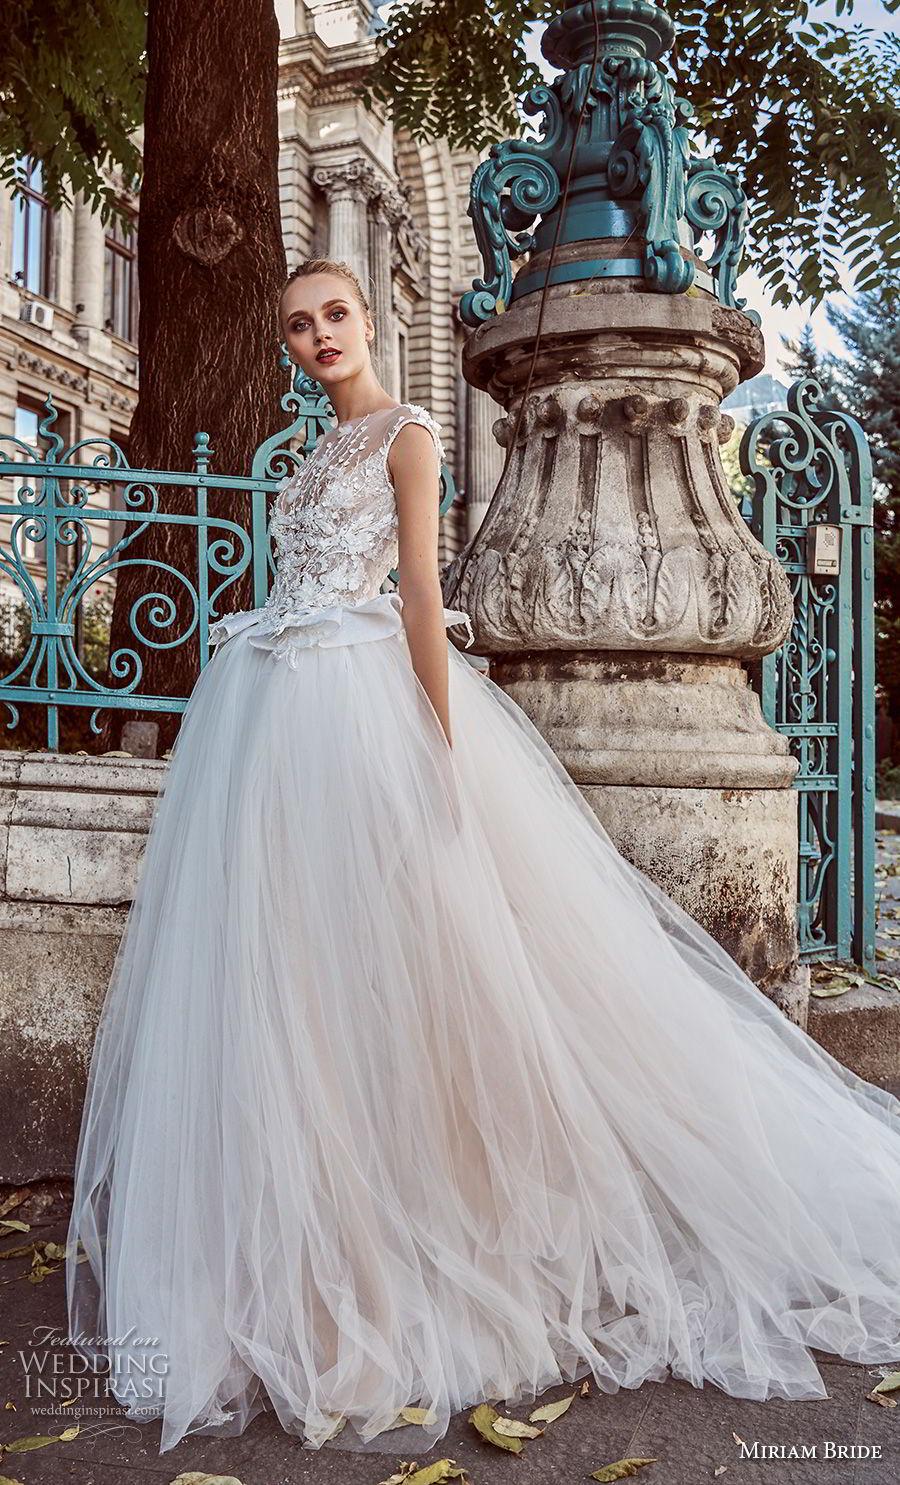 miriams bride 2018 bridal cap sleeves illusion bateau sweetheart neckline tulle skirt romantic ball gown a line wedding dress v back chapel train (1) mv